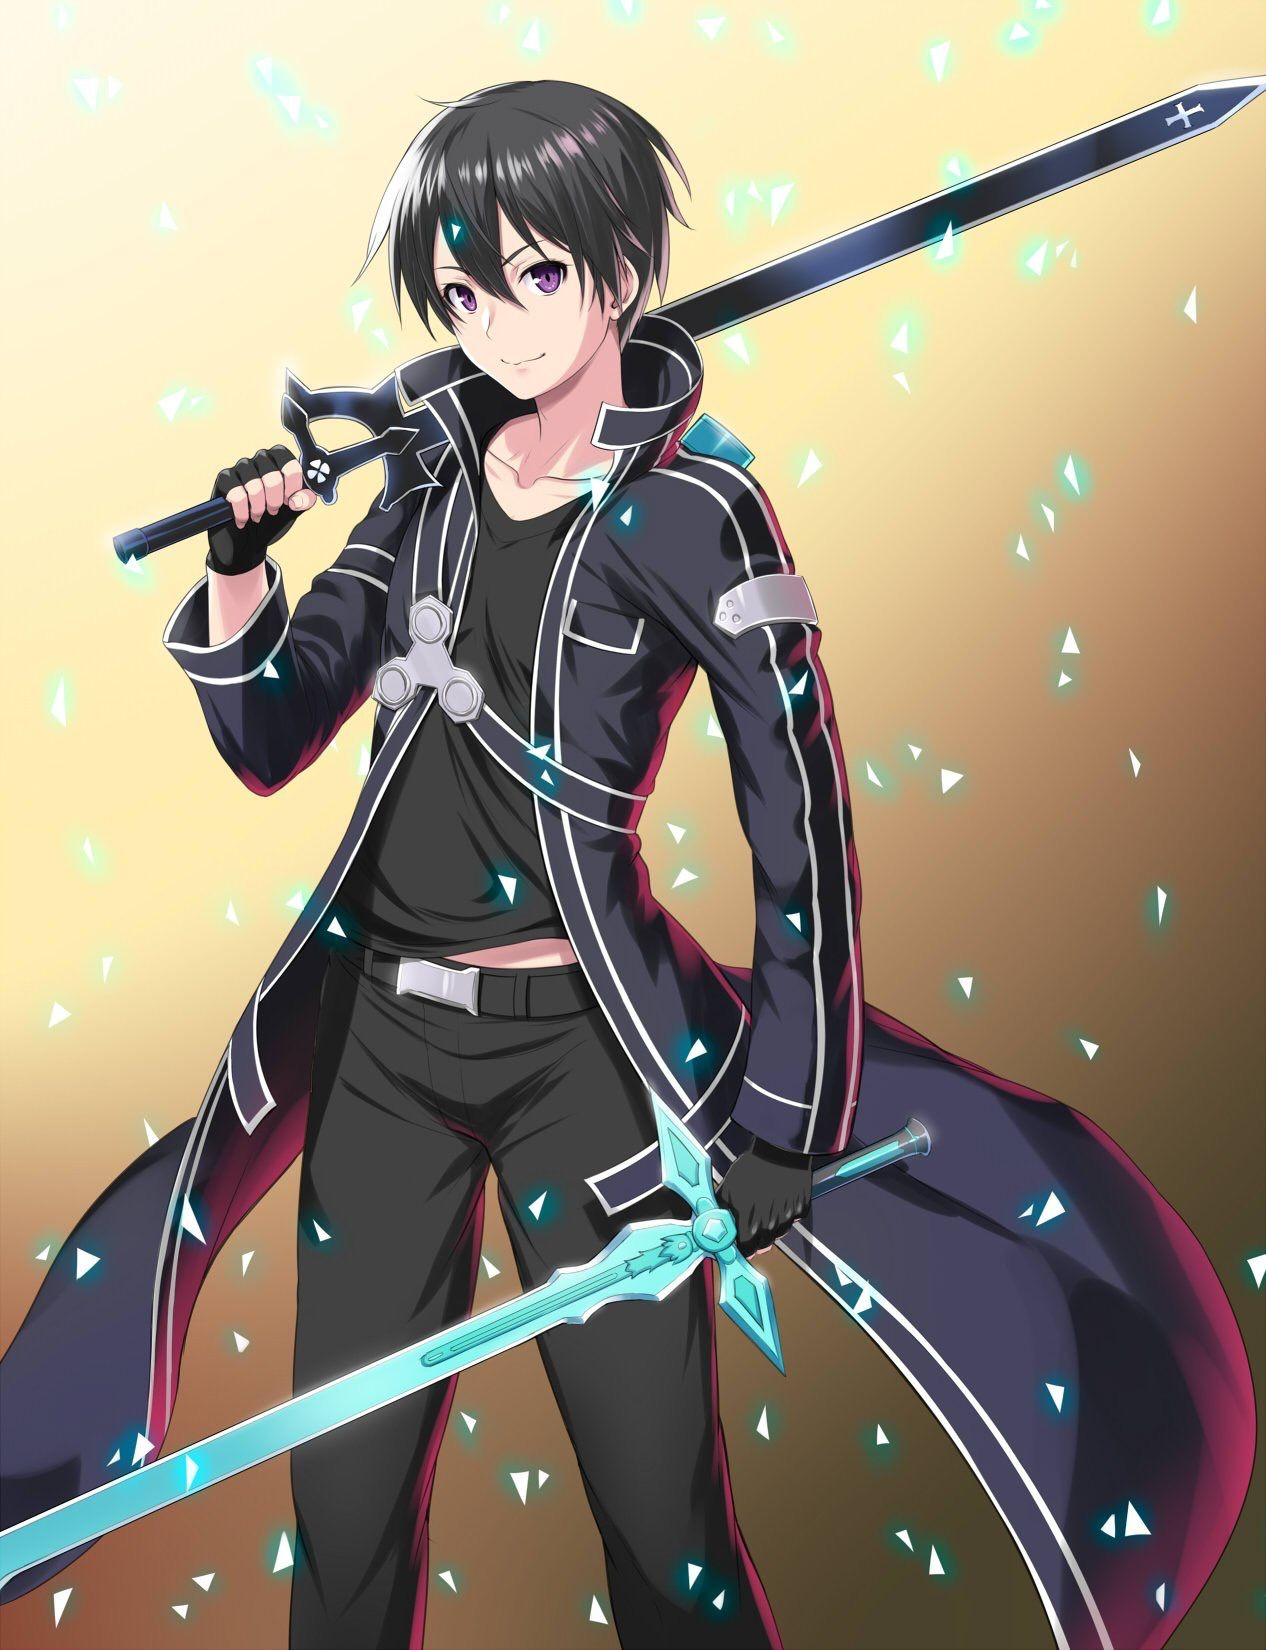 Pin By Octavio R On Sword Art Online Sword Art Online Kirito Sword Art Online Asuna Sword Art Online Wallpaper Anime boy with sword wallpaper